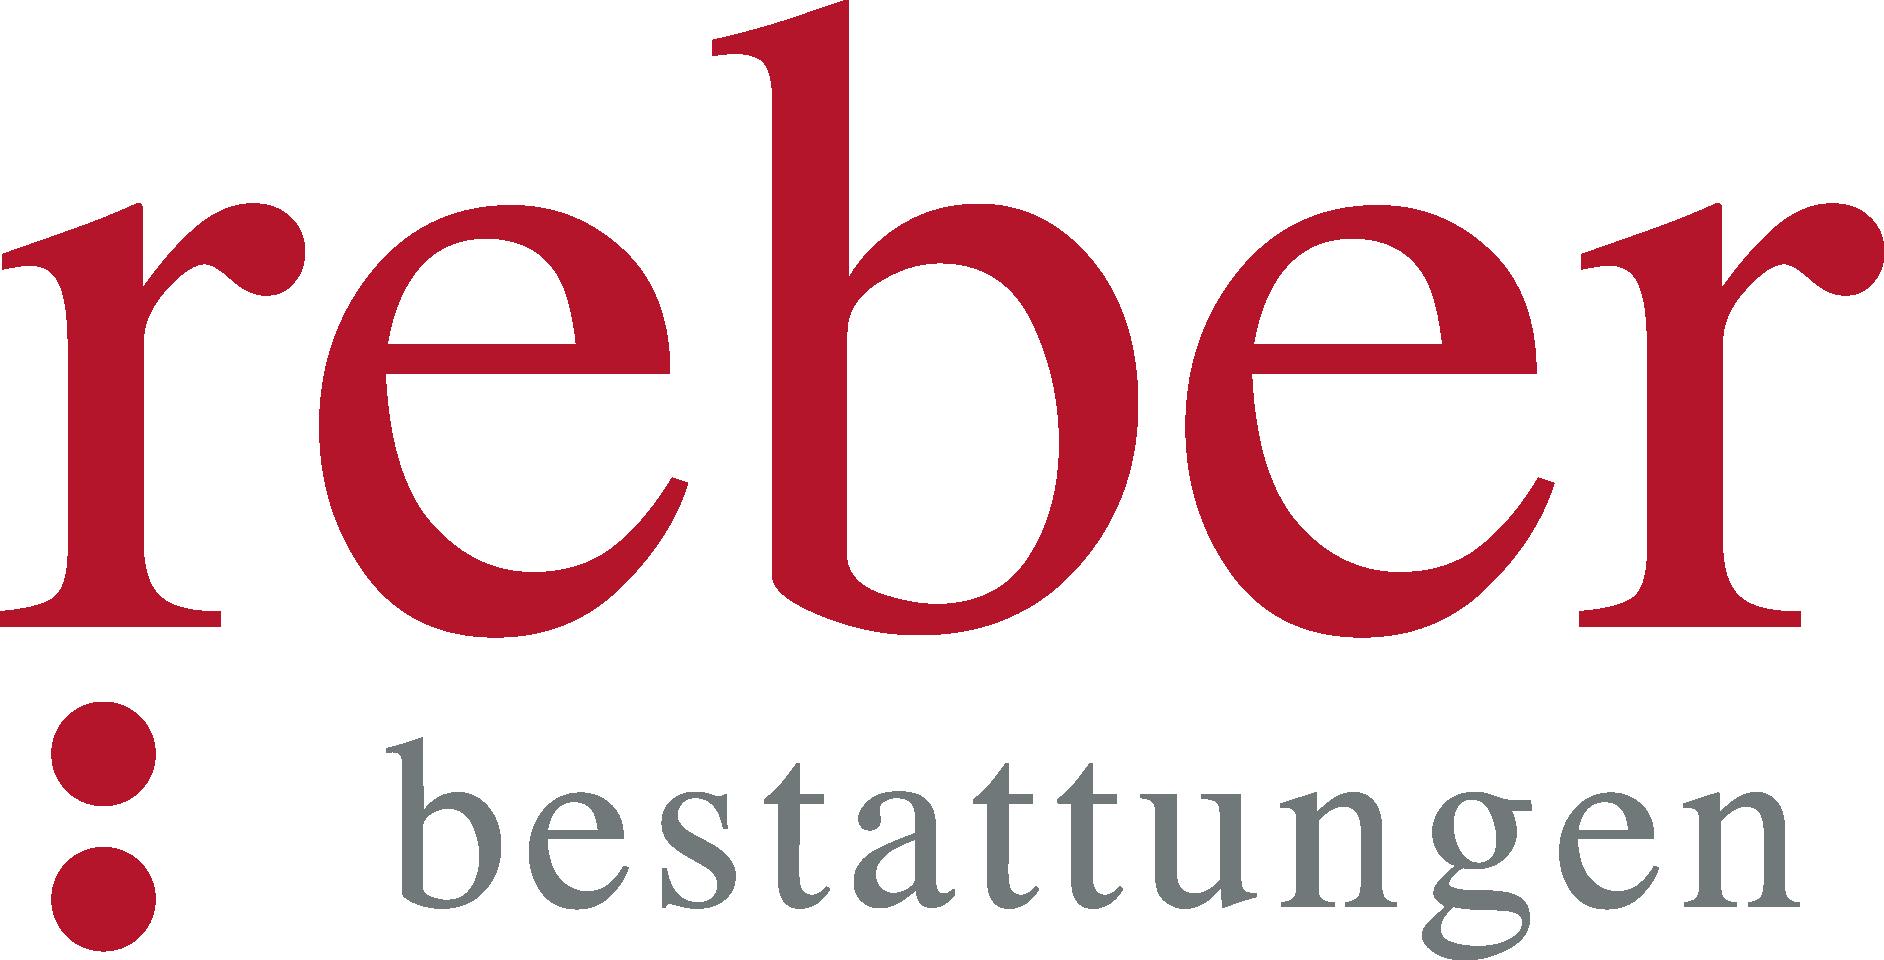 REBER Bestattungen – Logo